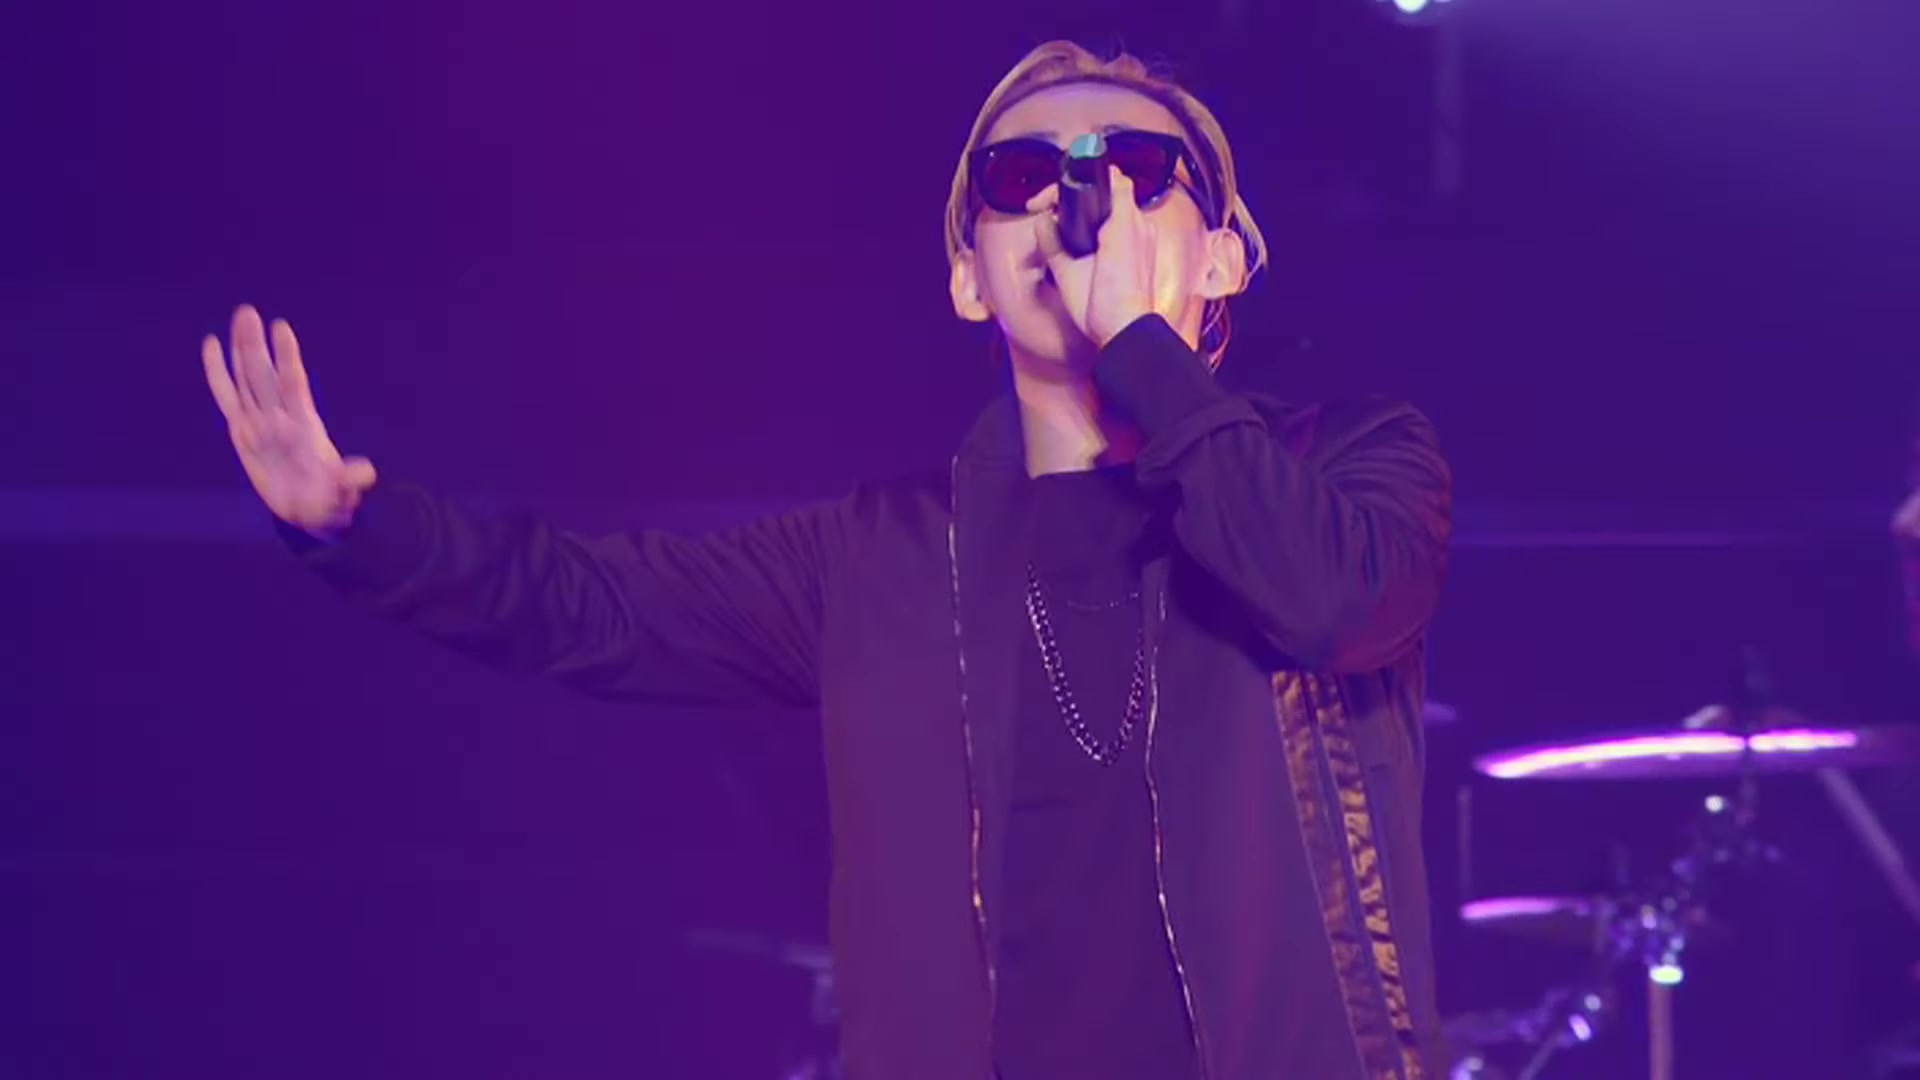 清水翔太 My Boo From Shota Shimizu Live Tour White 哔哩哔哩